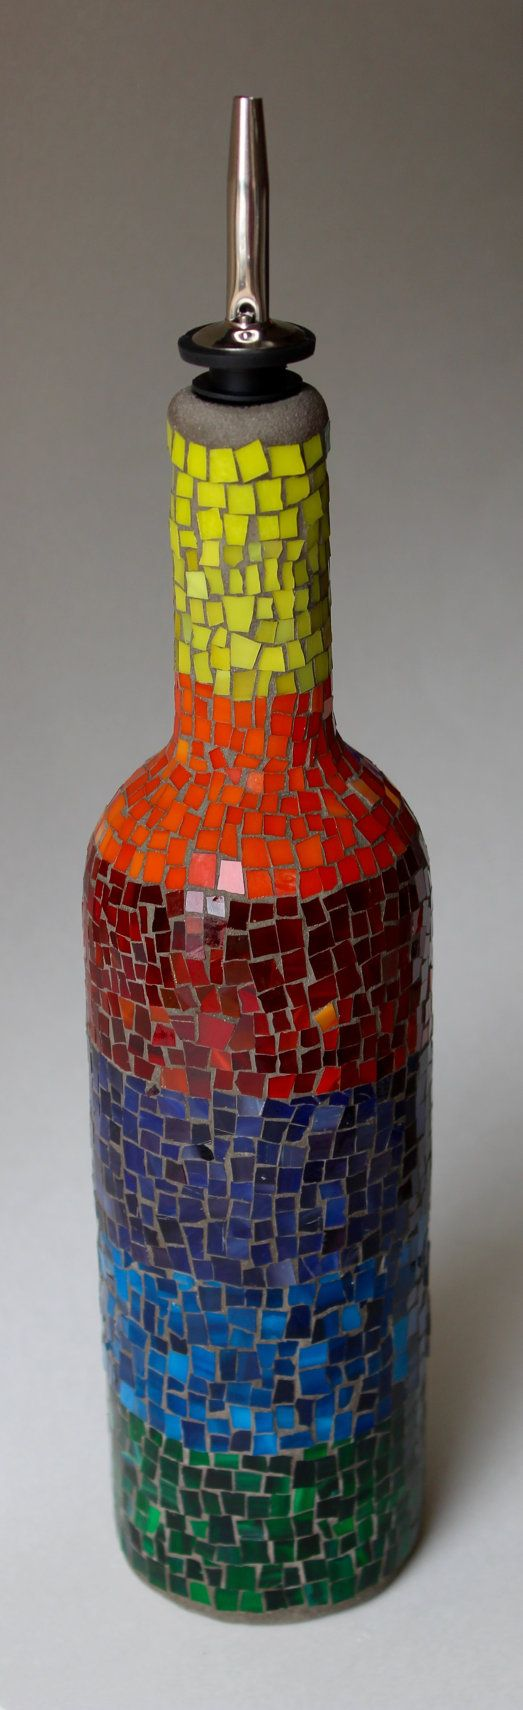 Rainbow mosaic bottle by MasterpieceGlass on Etsy